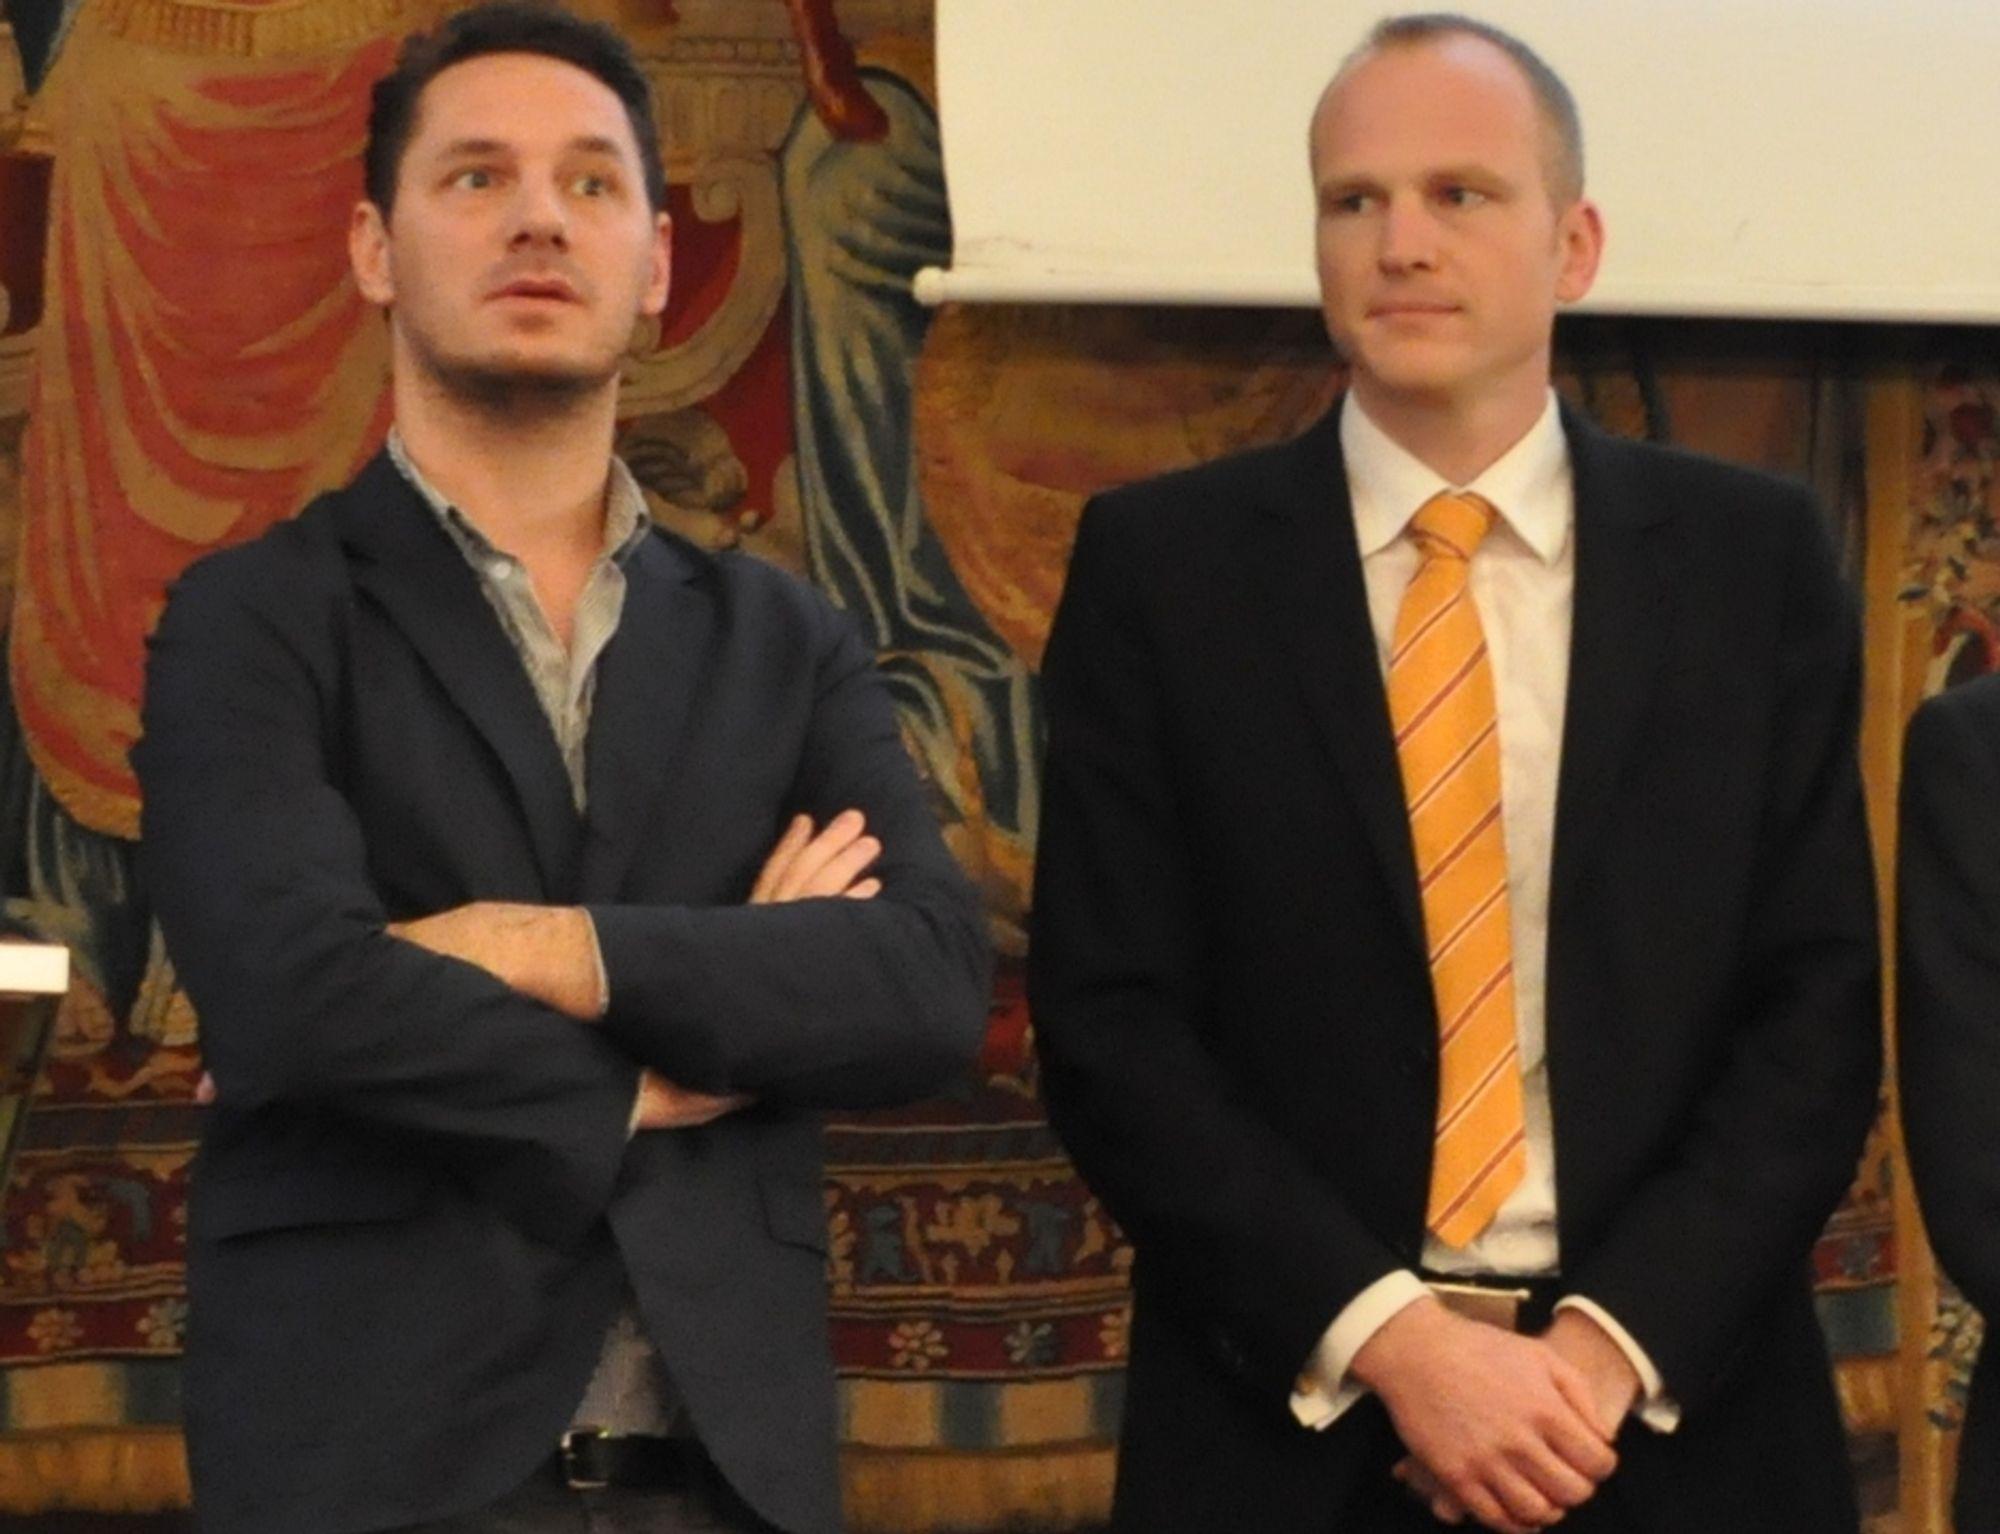 ANSPENT: Arkitekt Julien de Smedt og ingeniør Florian Kosche mottok Norsk Stålkonstruksjonspris 2011 på Ståldagen 3. november i år.